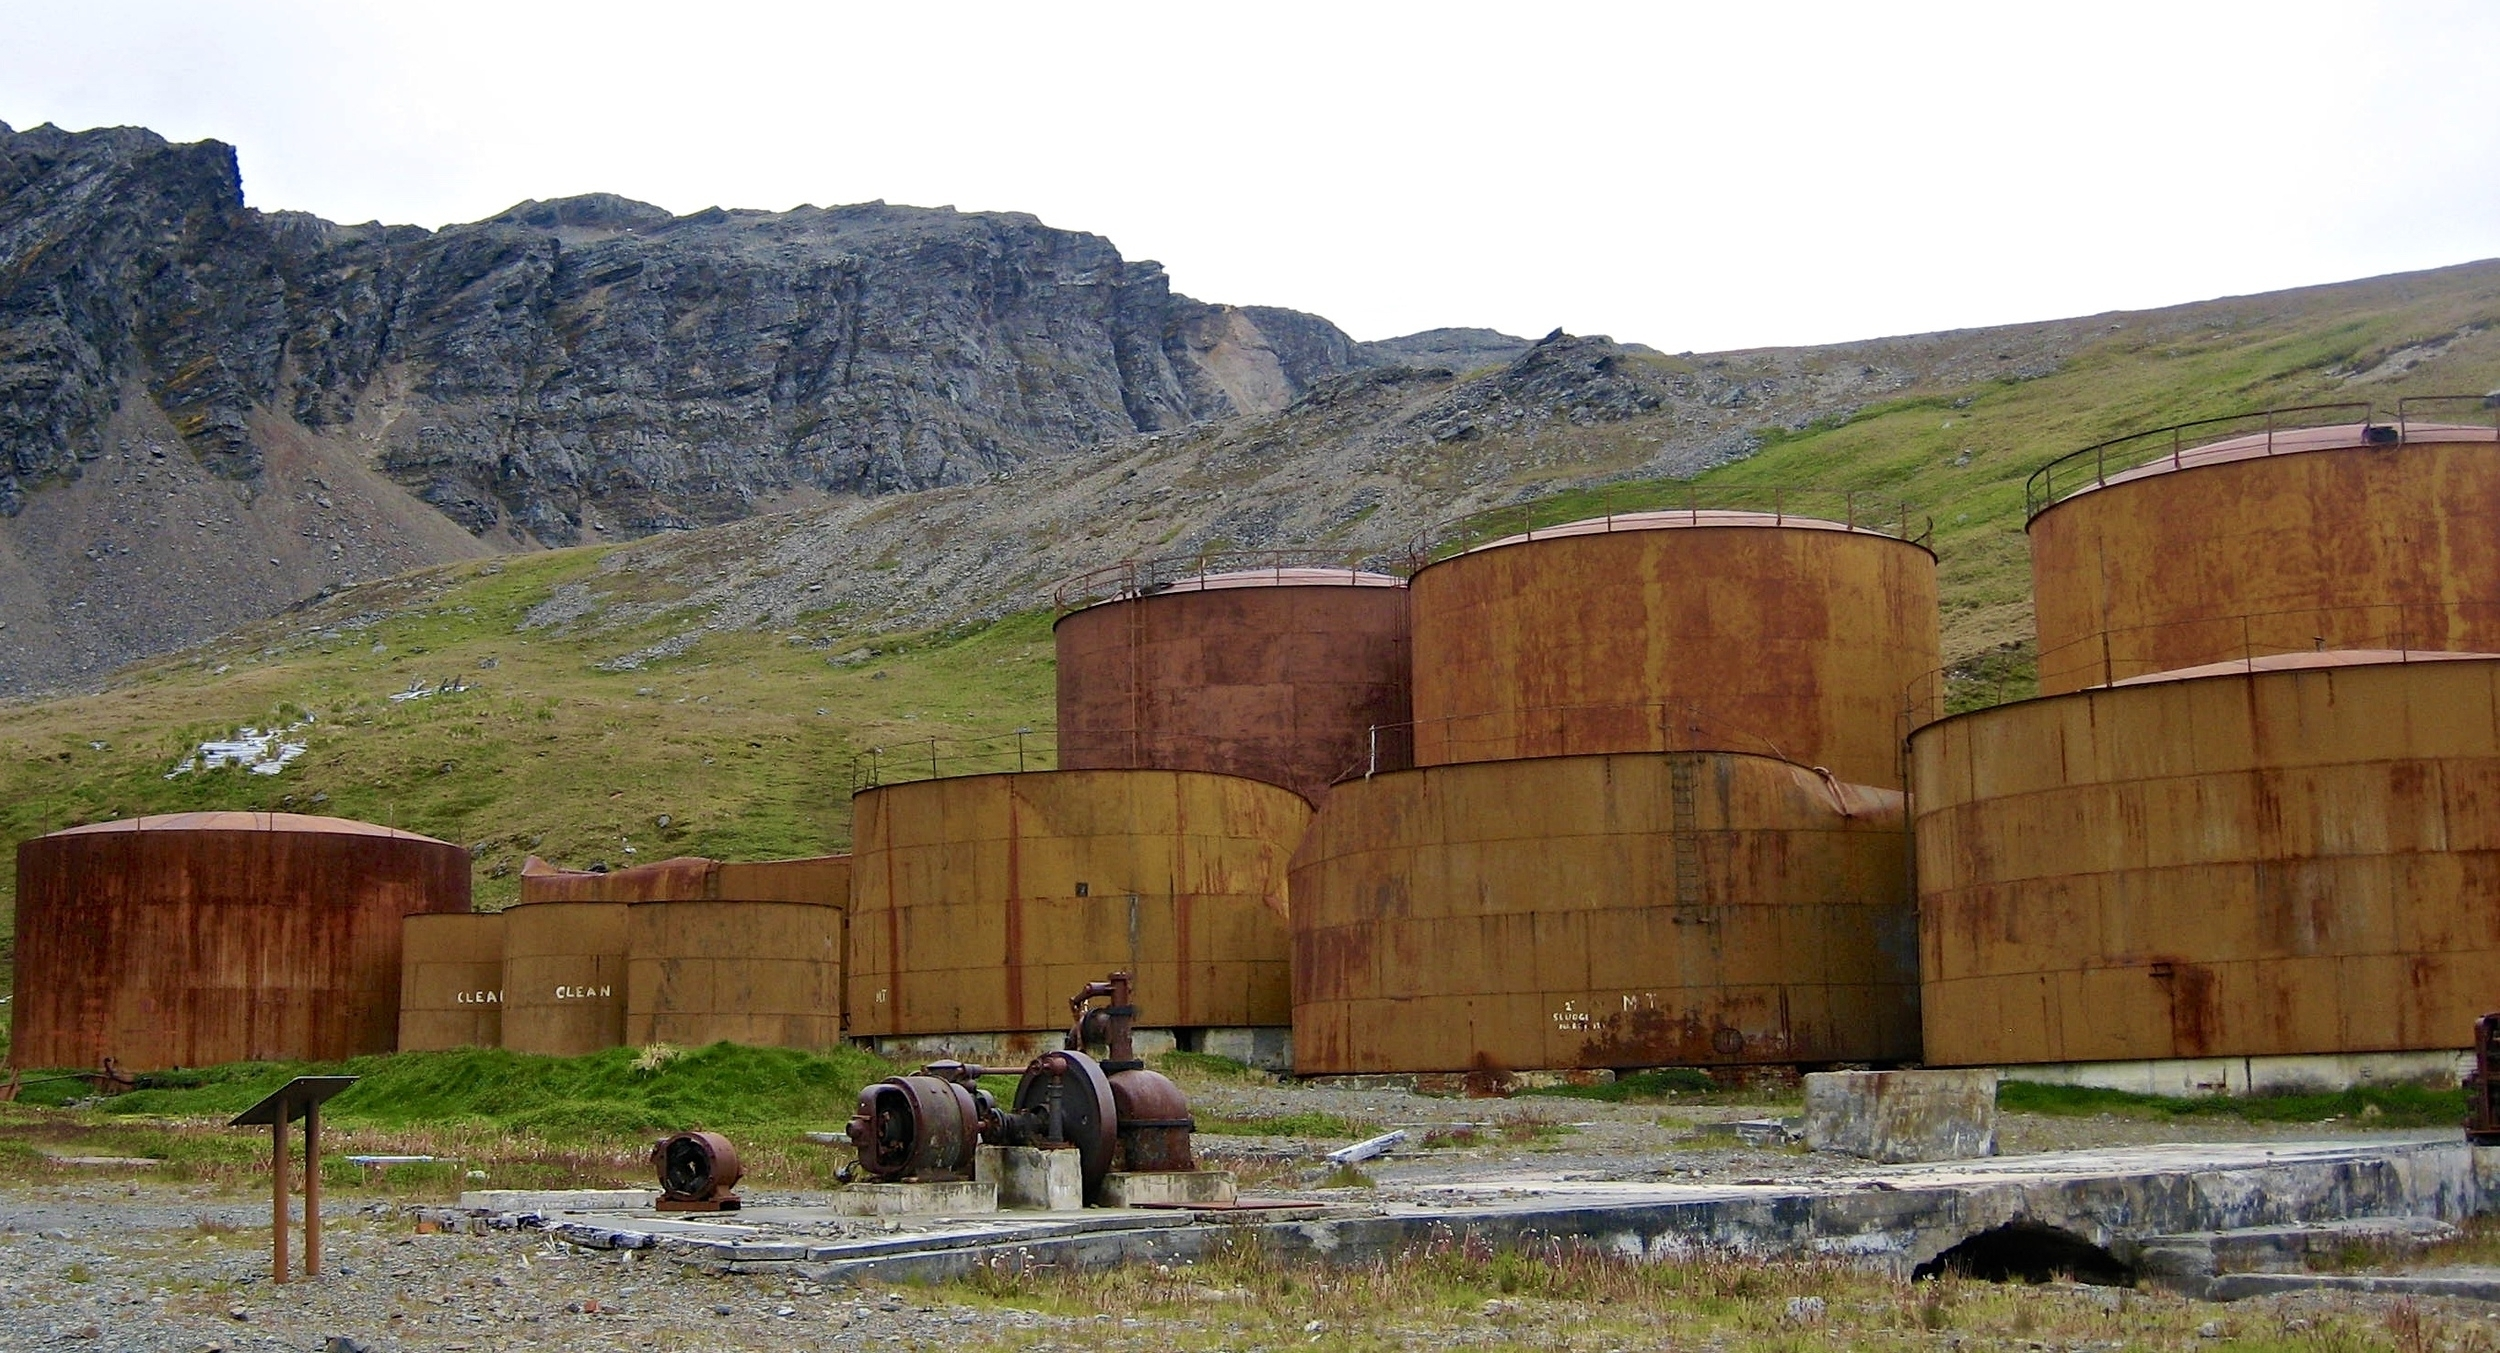 Huge Whale Oil Drums